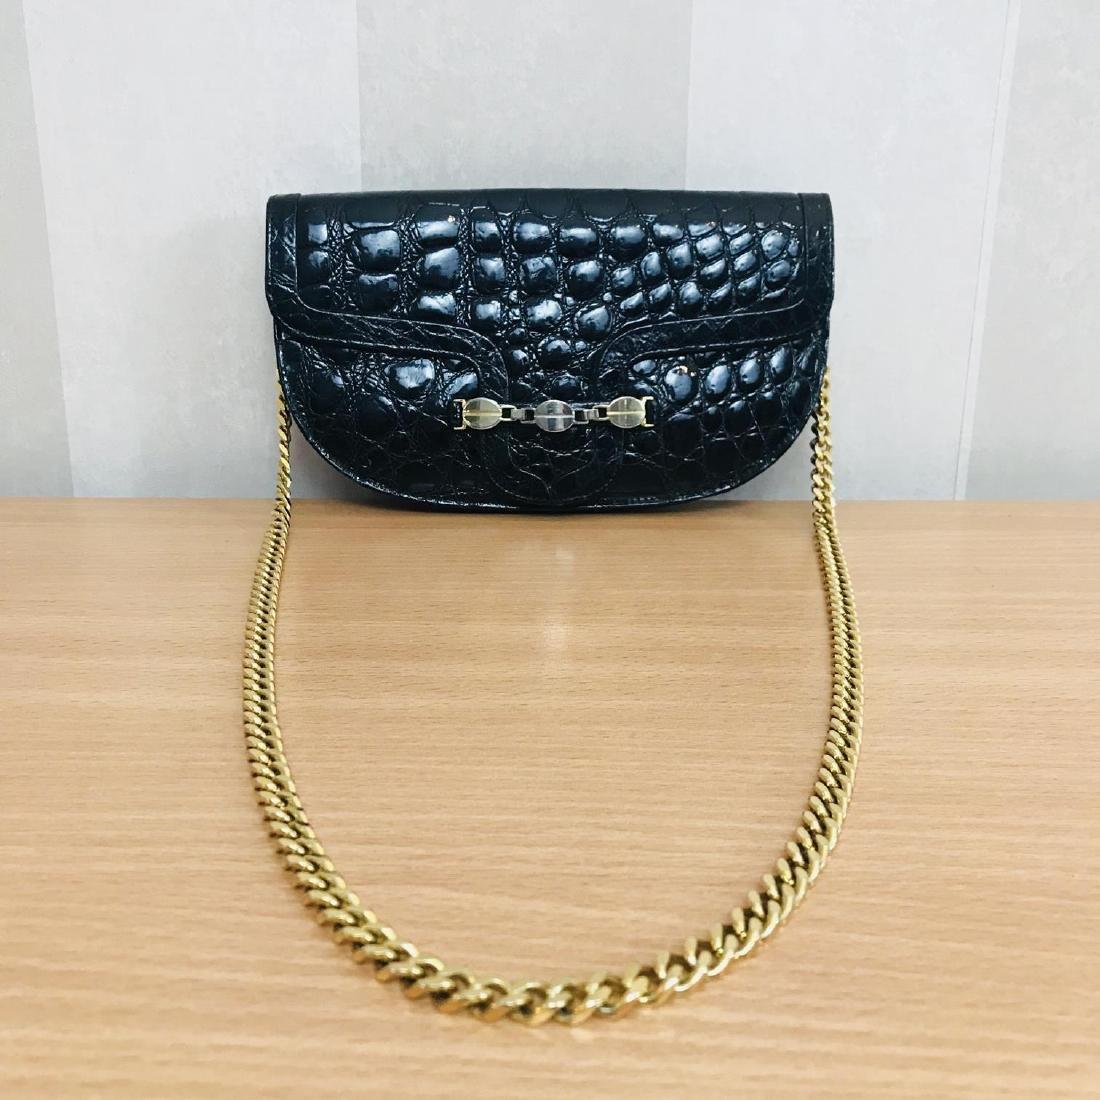 Vintage Crocodile Imitation Leather Clutch Bag